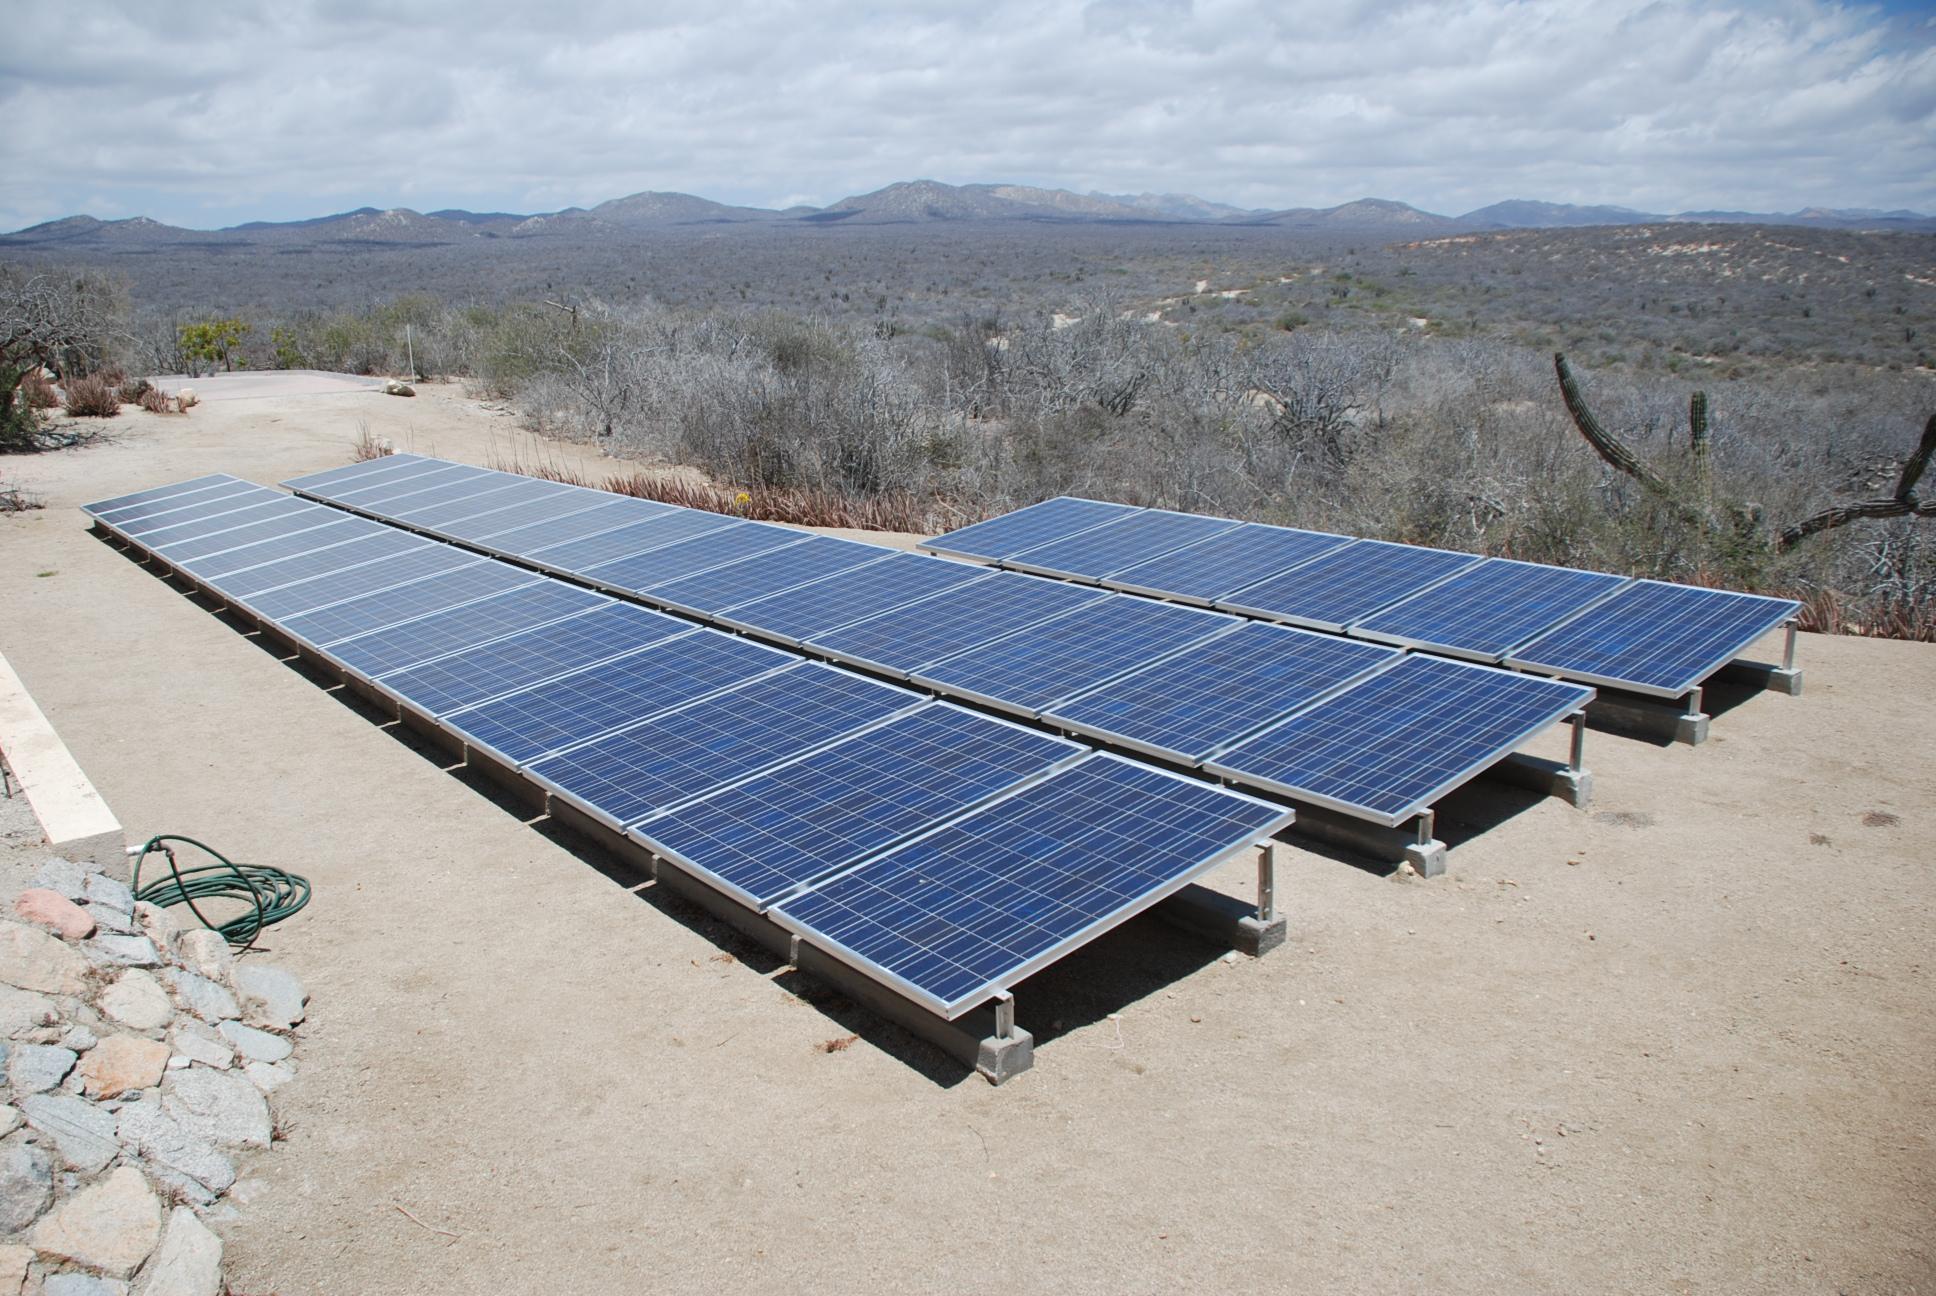 https://upload.wikimedia.org/wikipedia/commons/6/61/Solar_panels.JPG